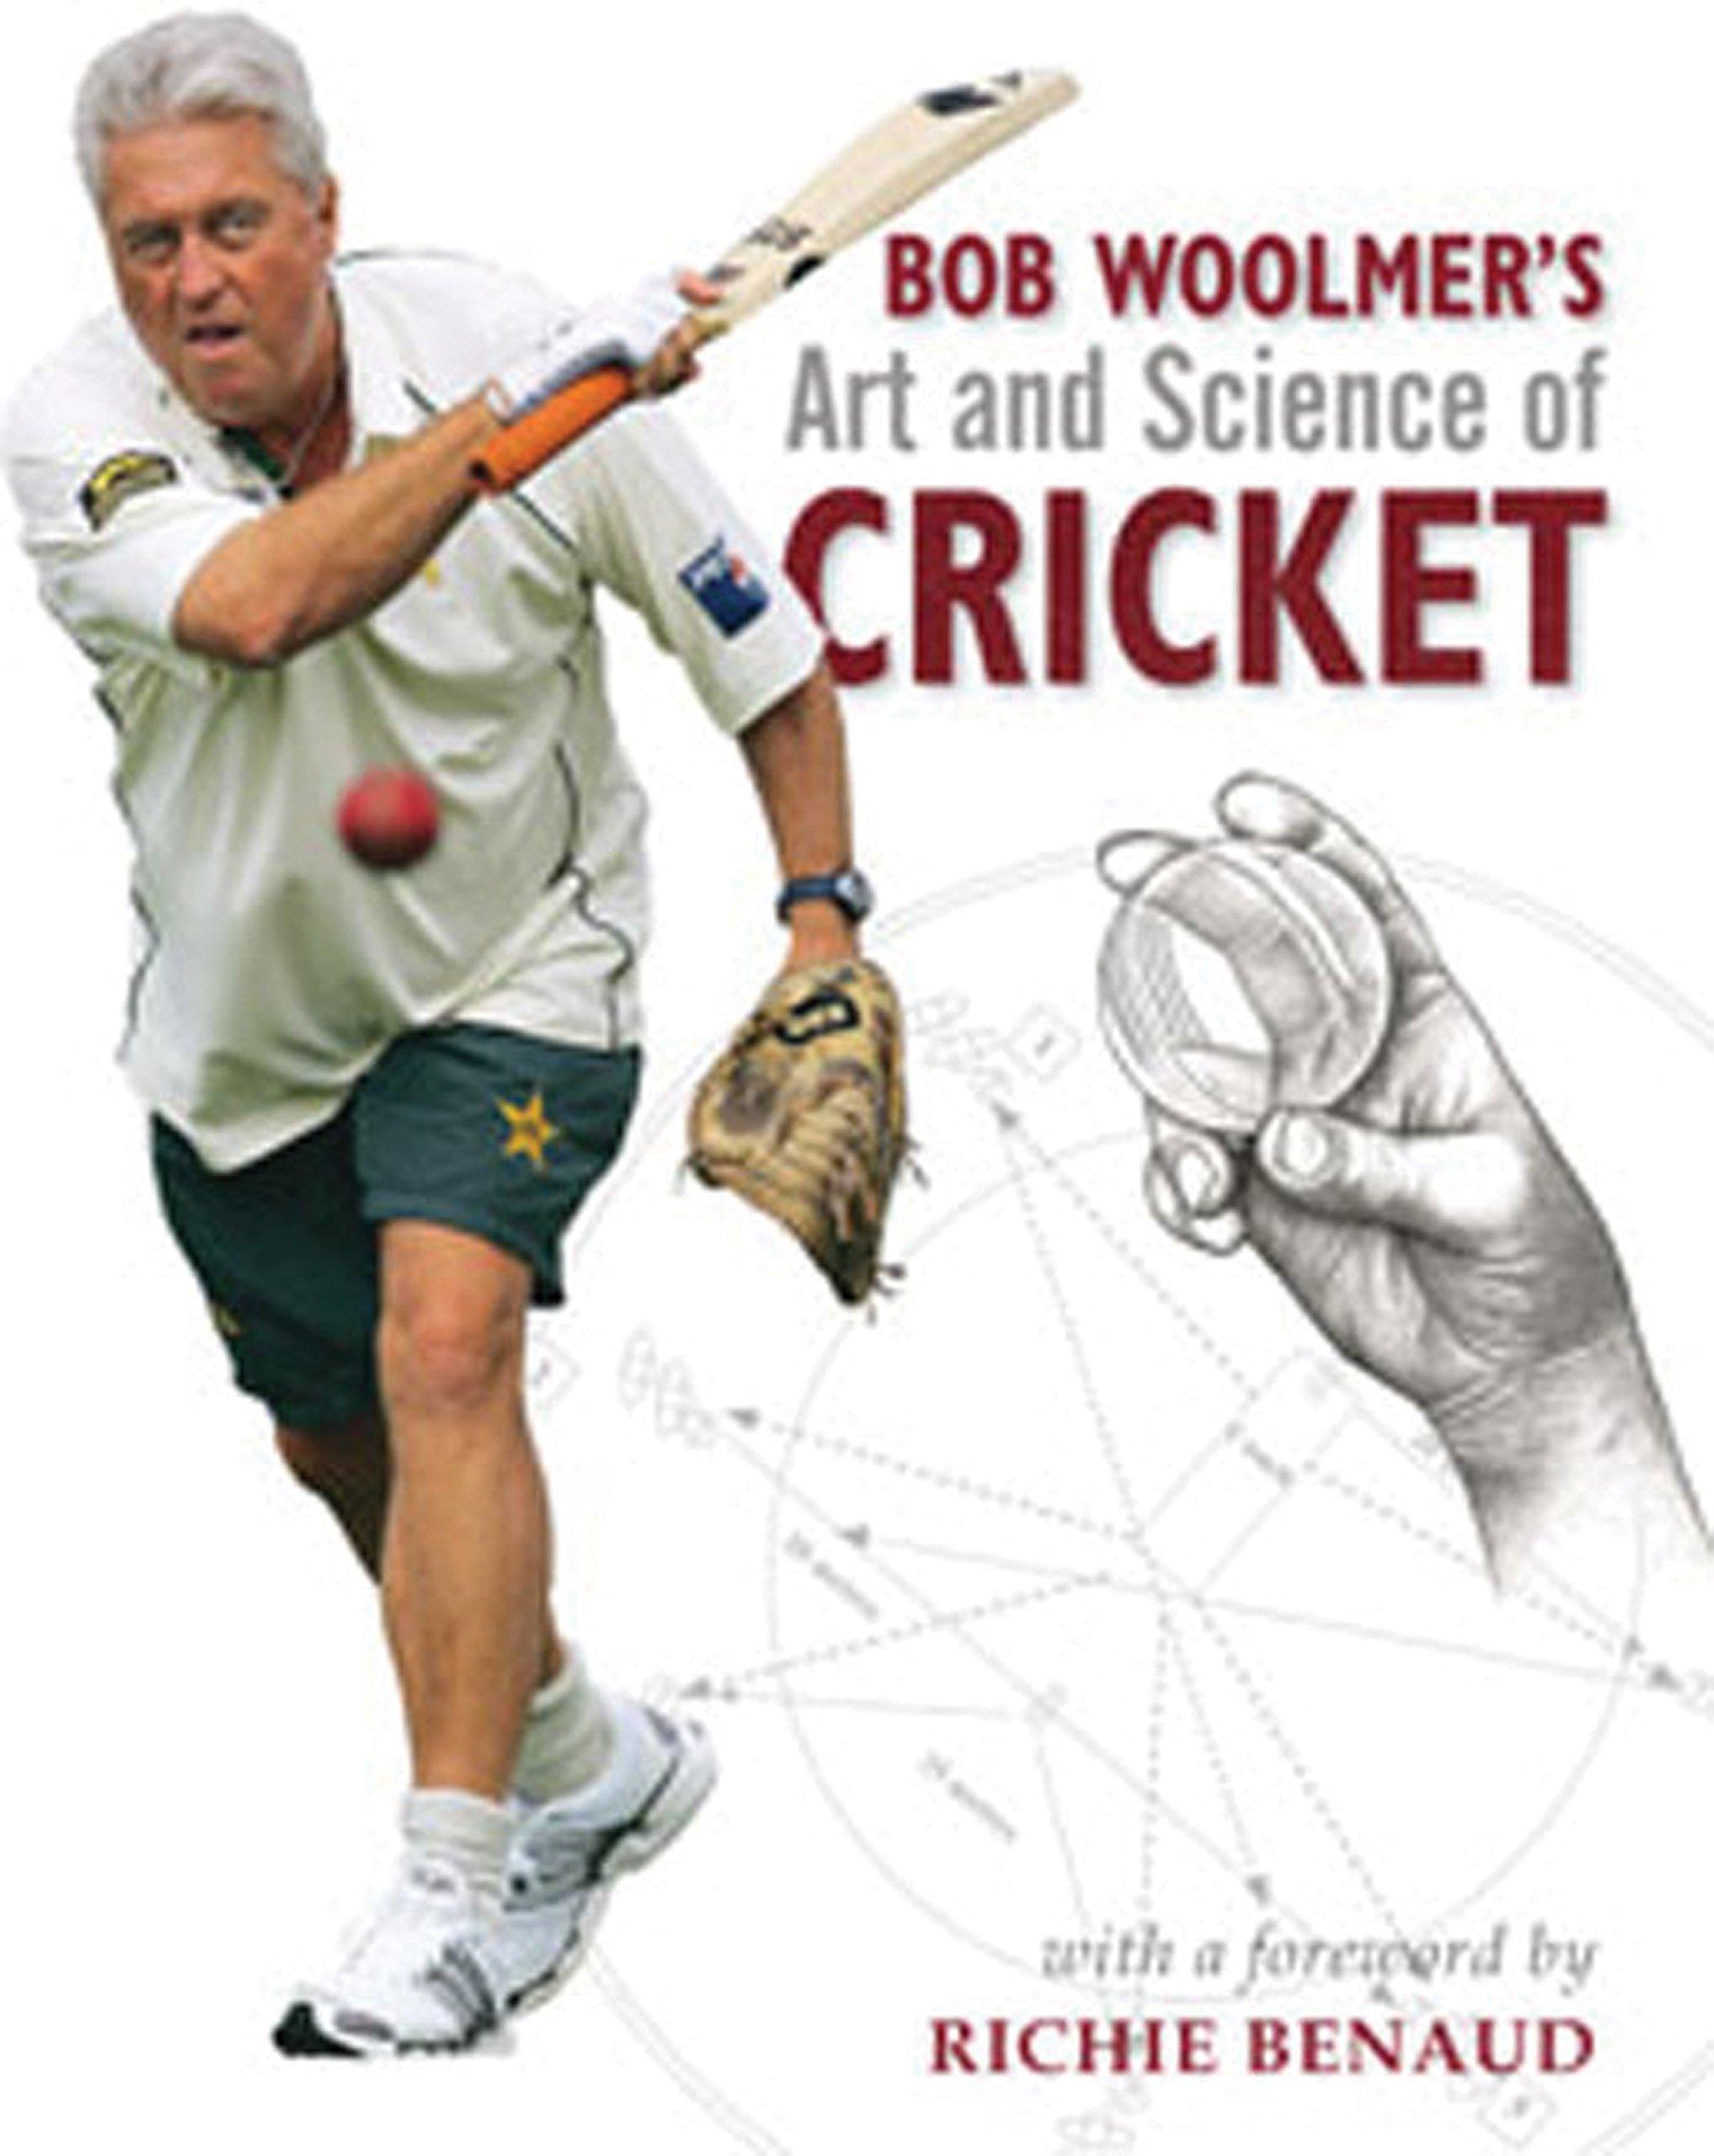 Bob Woolmer's Art and Science of Cricket ebook